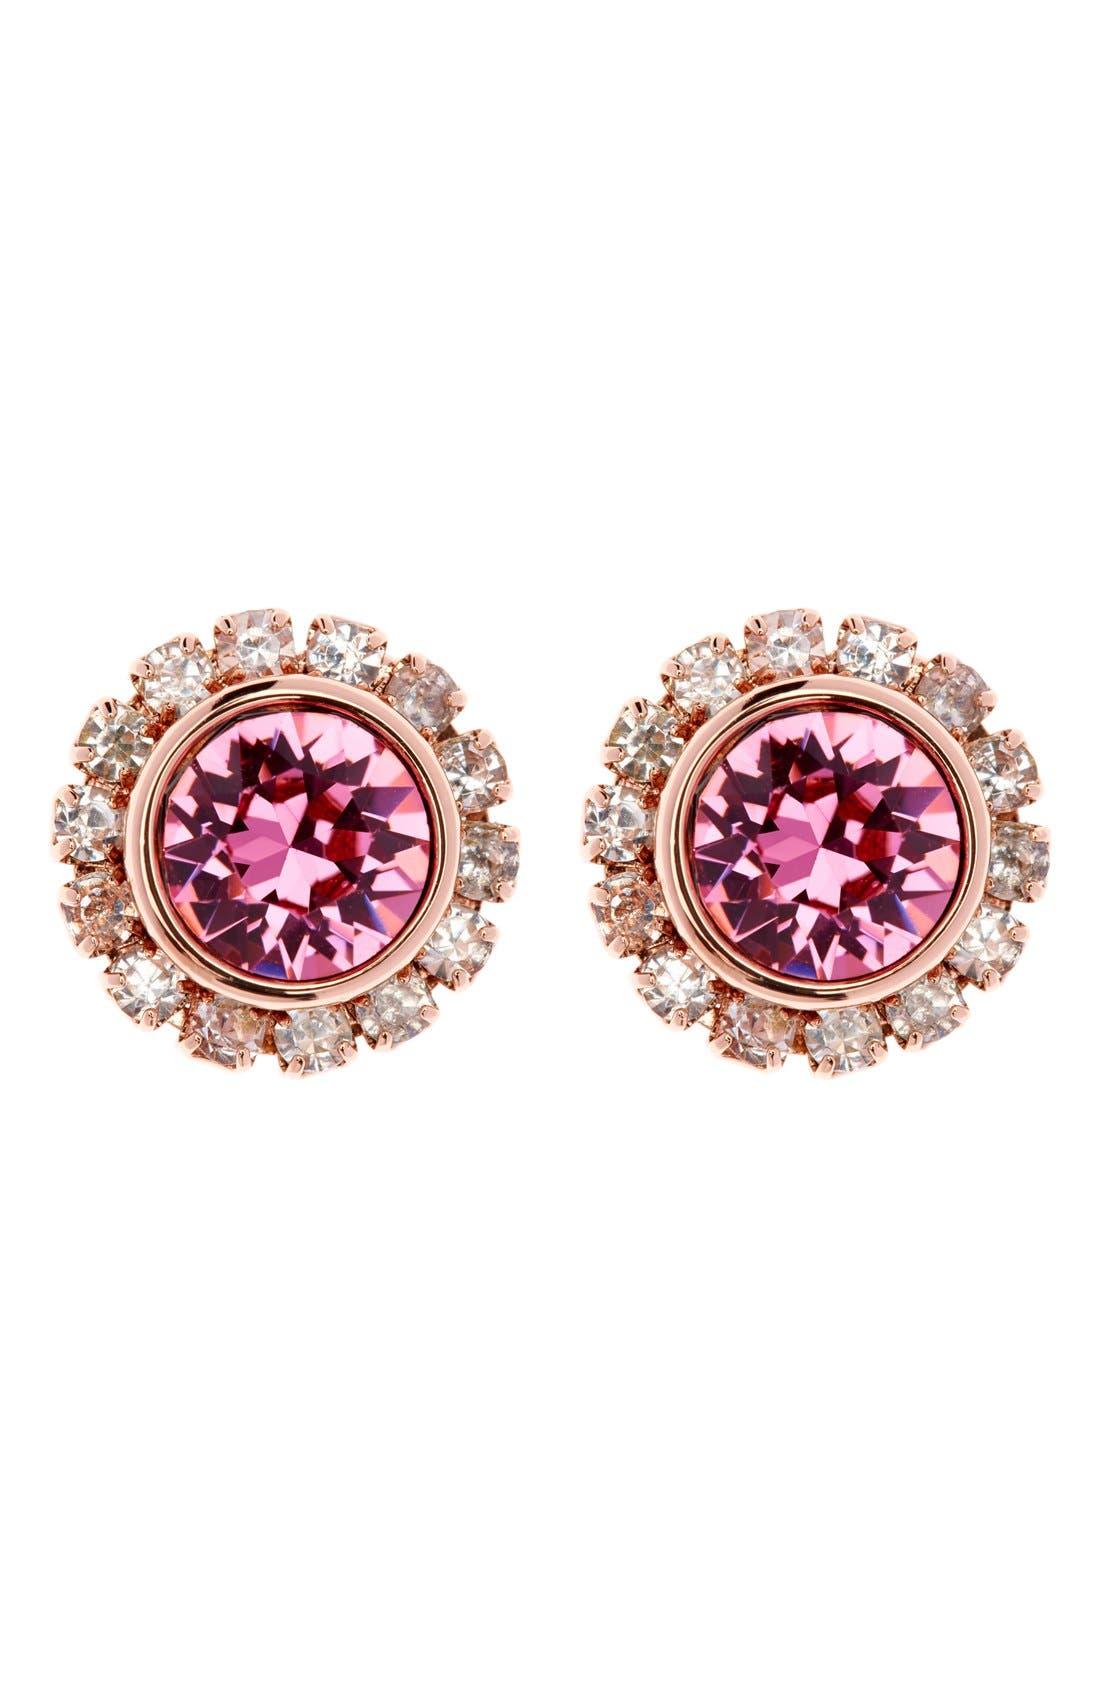 Alternate Image 1 Selected - Ted Baker London 'Crystal Daisy' Stud Earrings